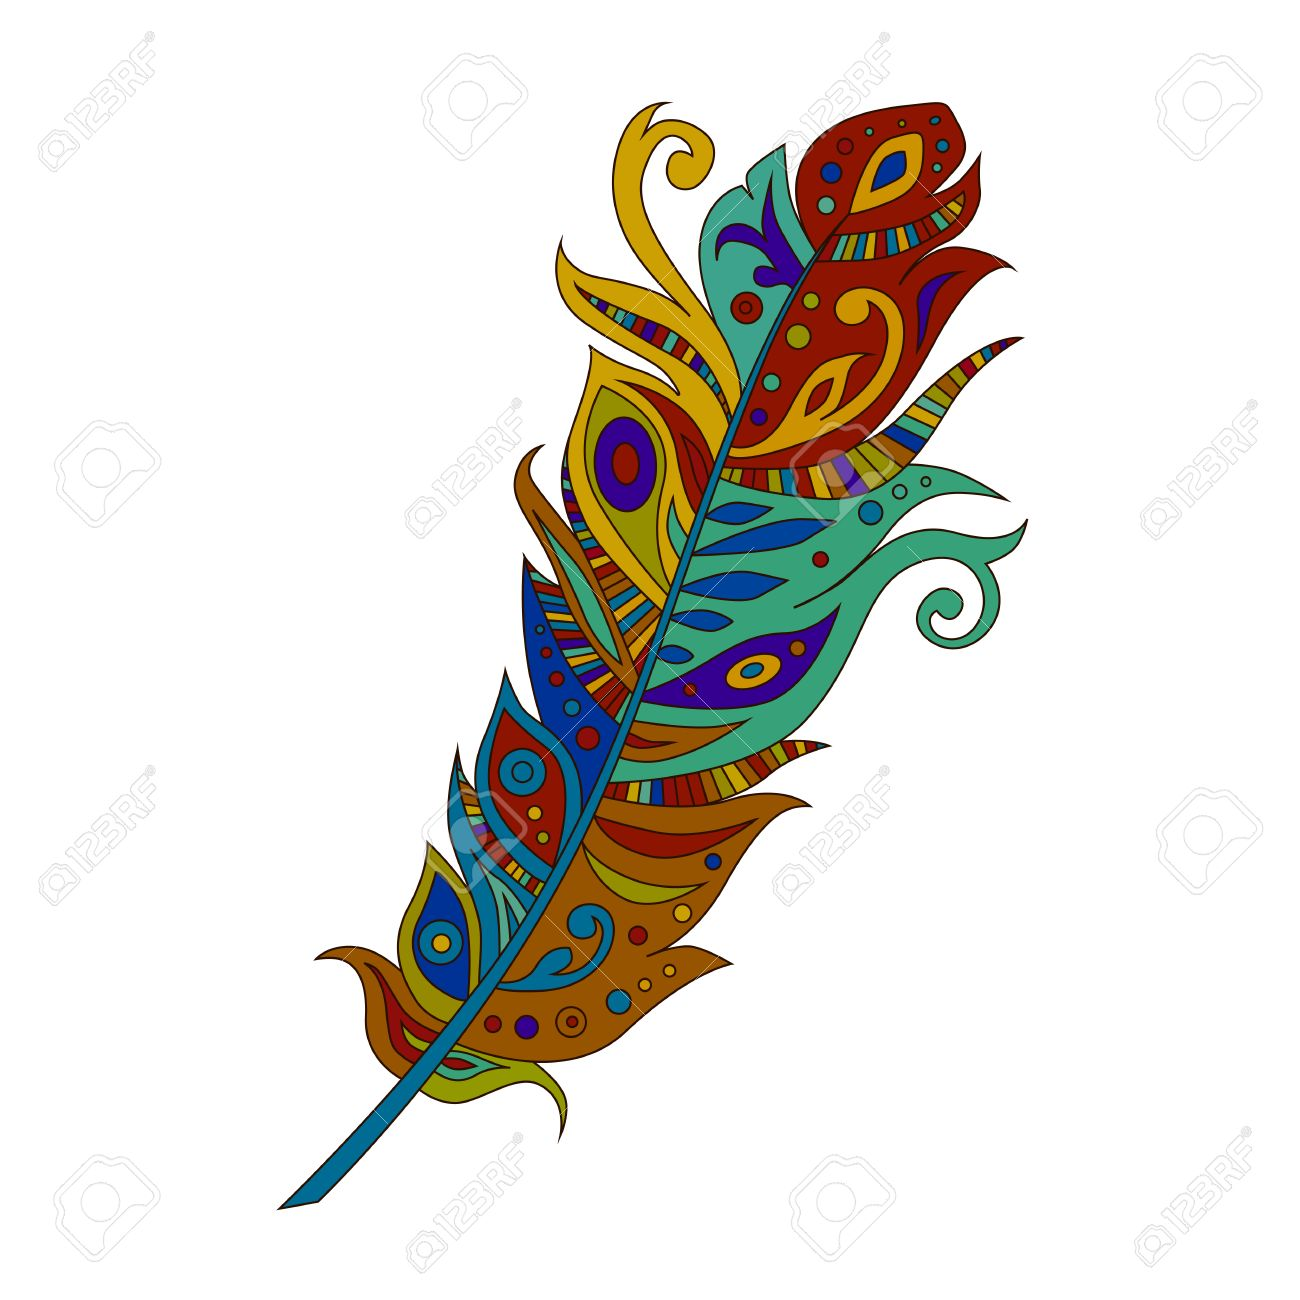 bright colored bohemian boho bird feather isolated on white rh 123rf com